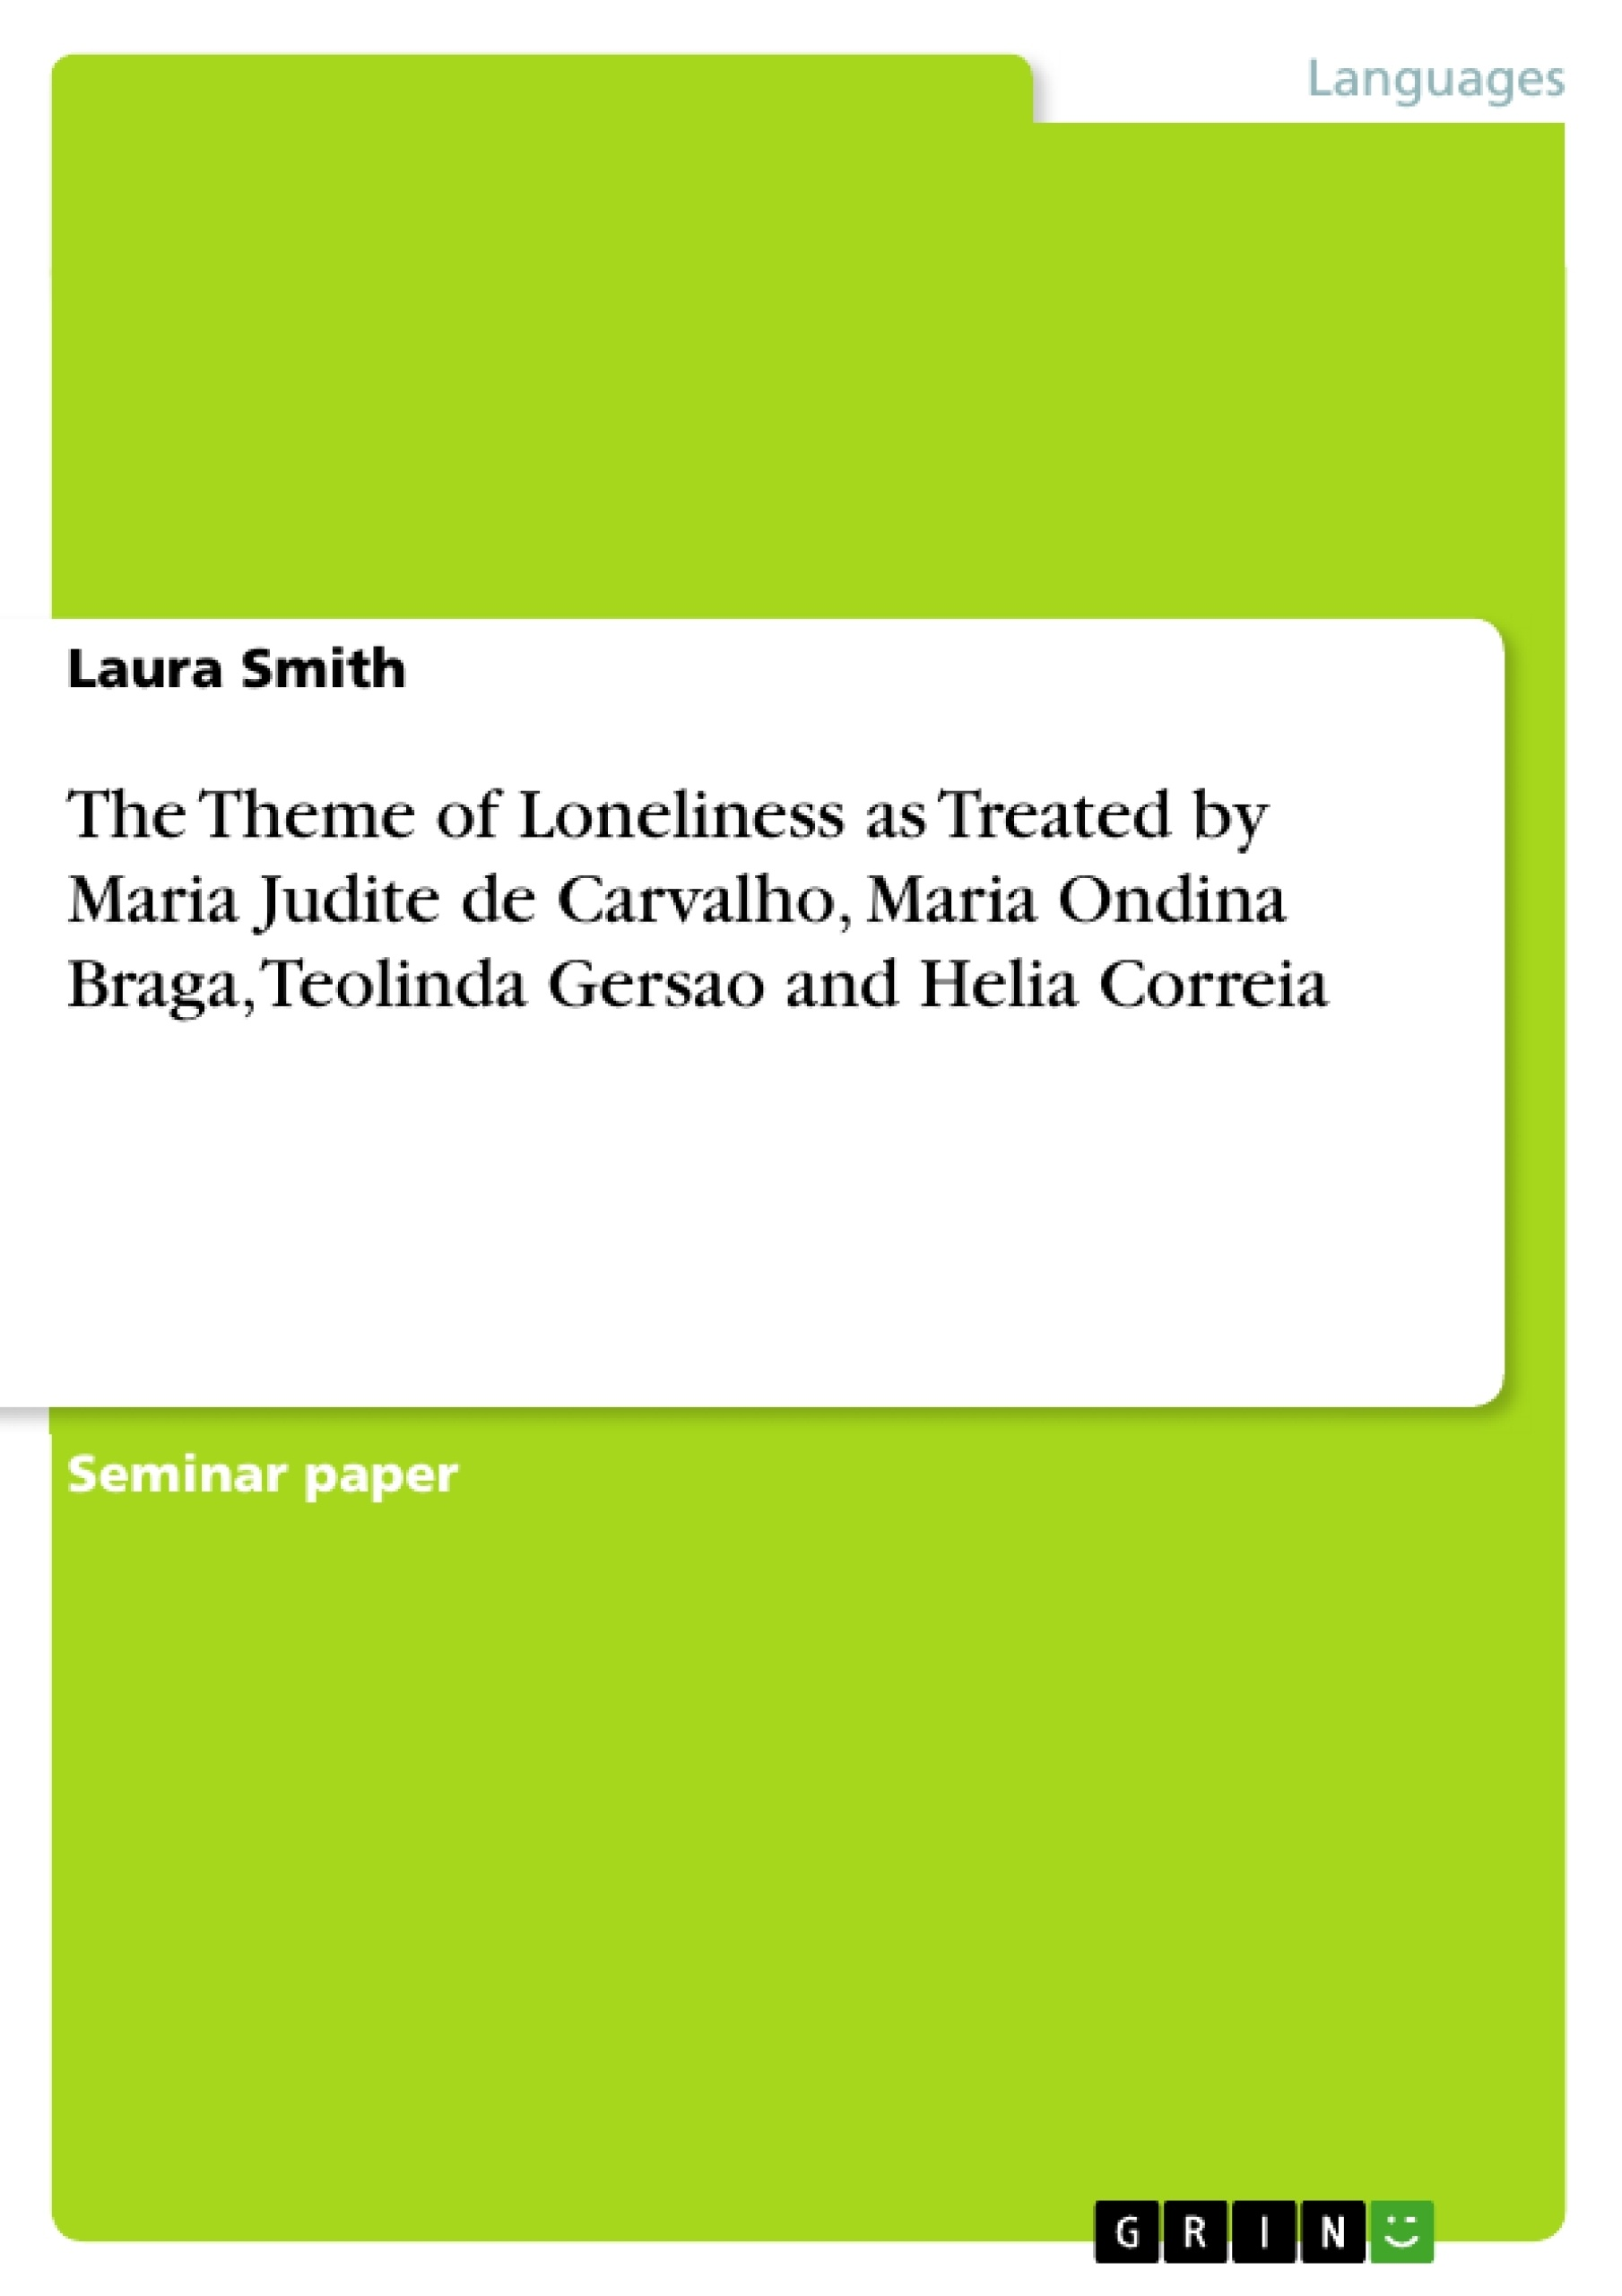 Title: The Theme of Loneliness as Treated by Maria Judite de Carvalho, Maria Ondina Braga, Teolinda Gersao and Helia Correia